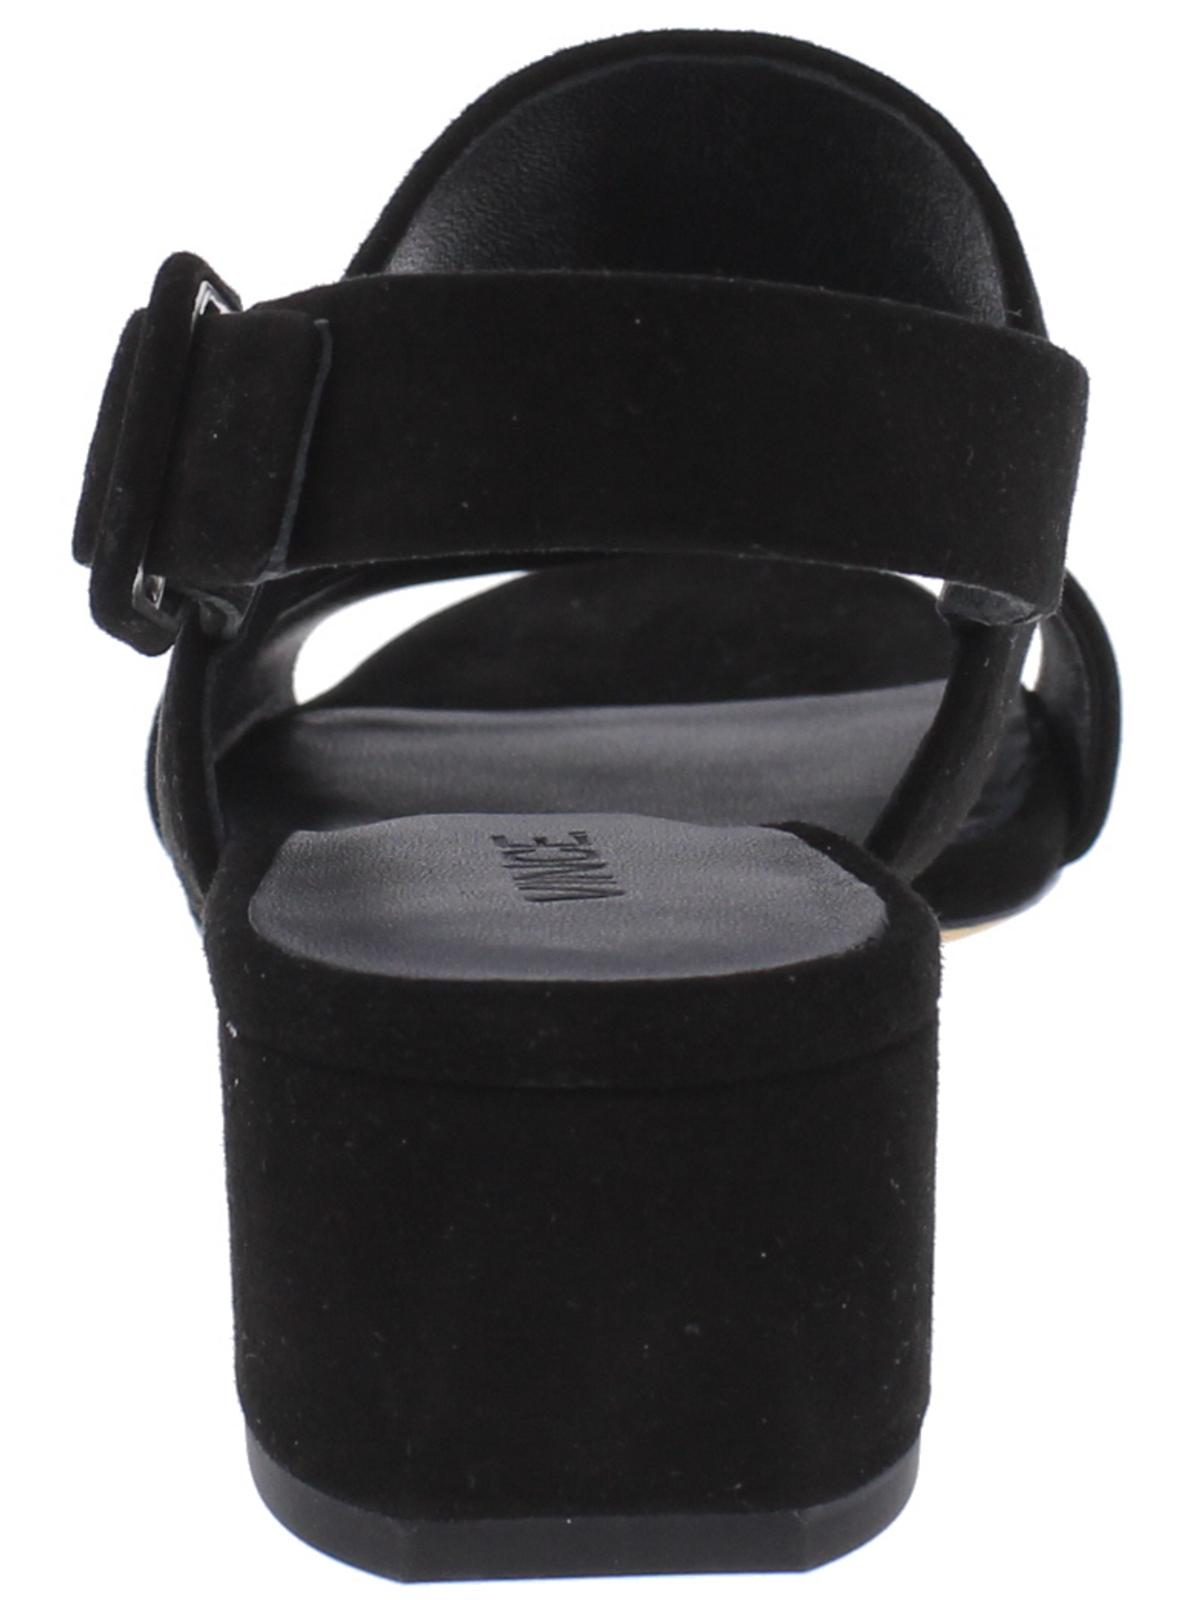 Vince Womens Taye Strappy Open Toe Block Heels Black 6.5 Medium (B,M)